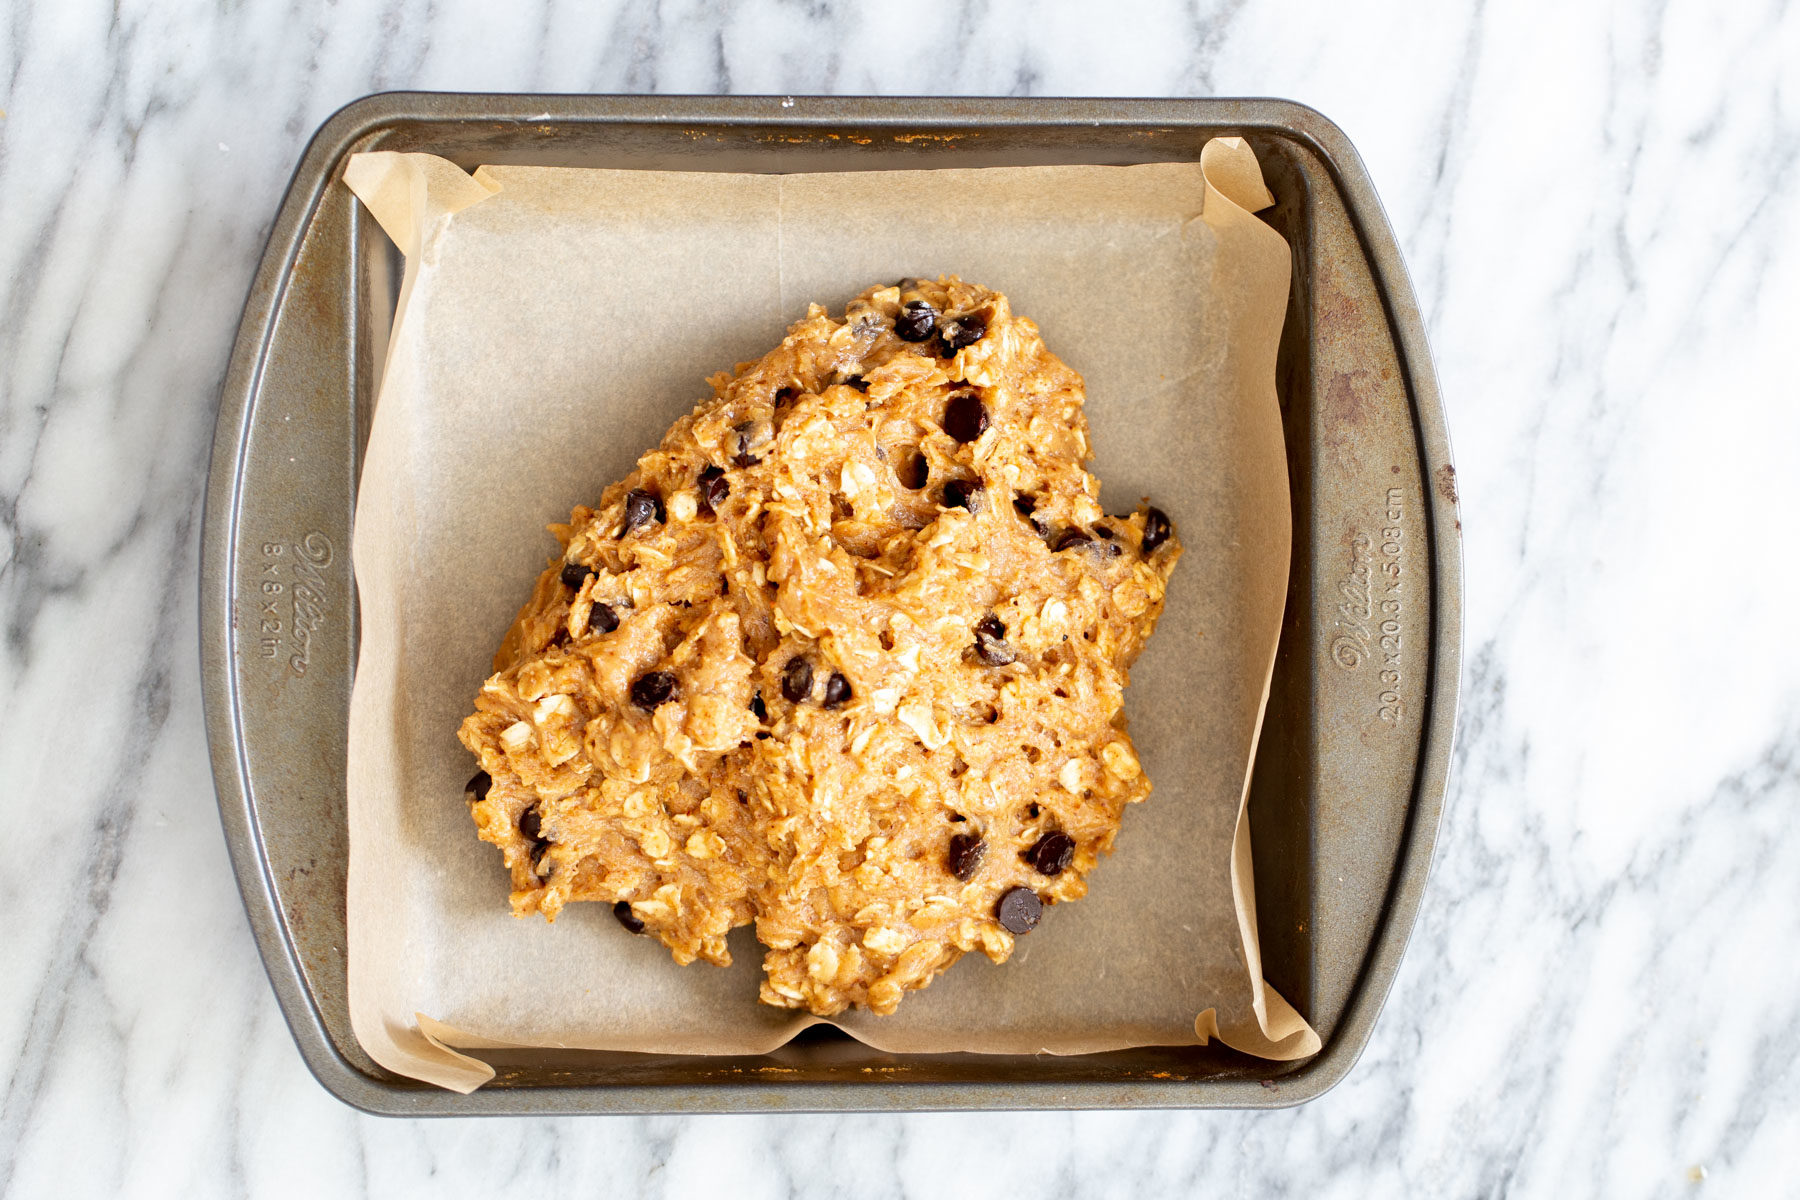 vegan date caramel oatmeal bar batter being added to a square baking pan